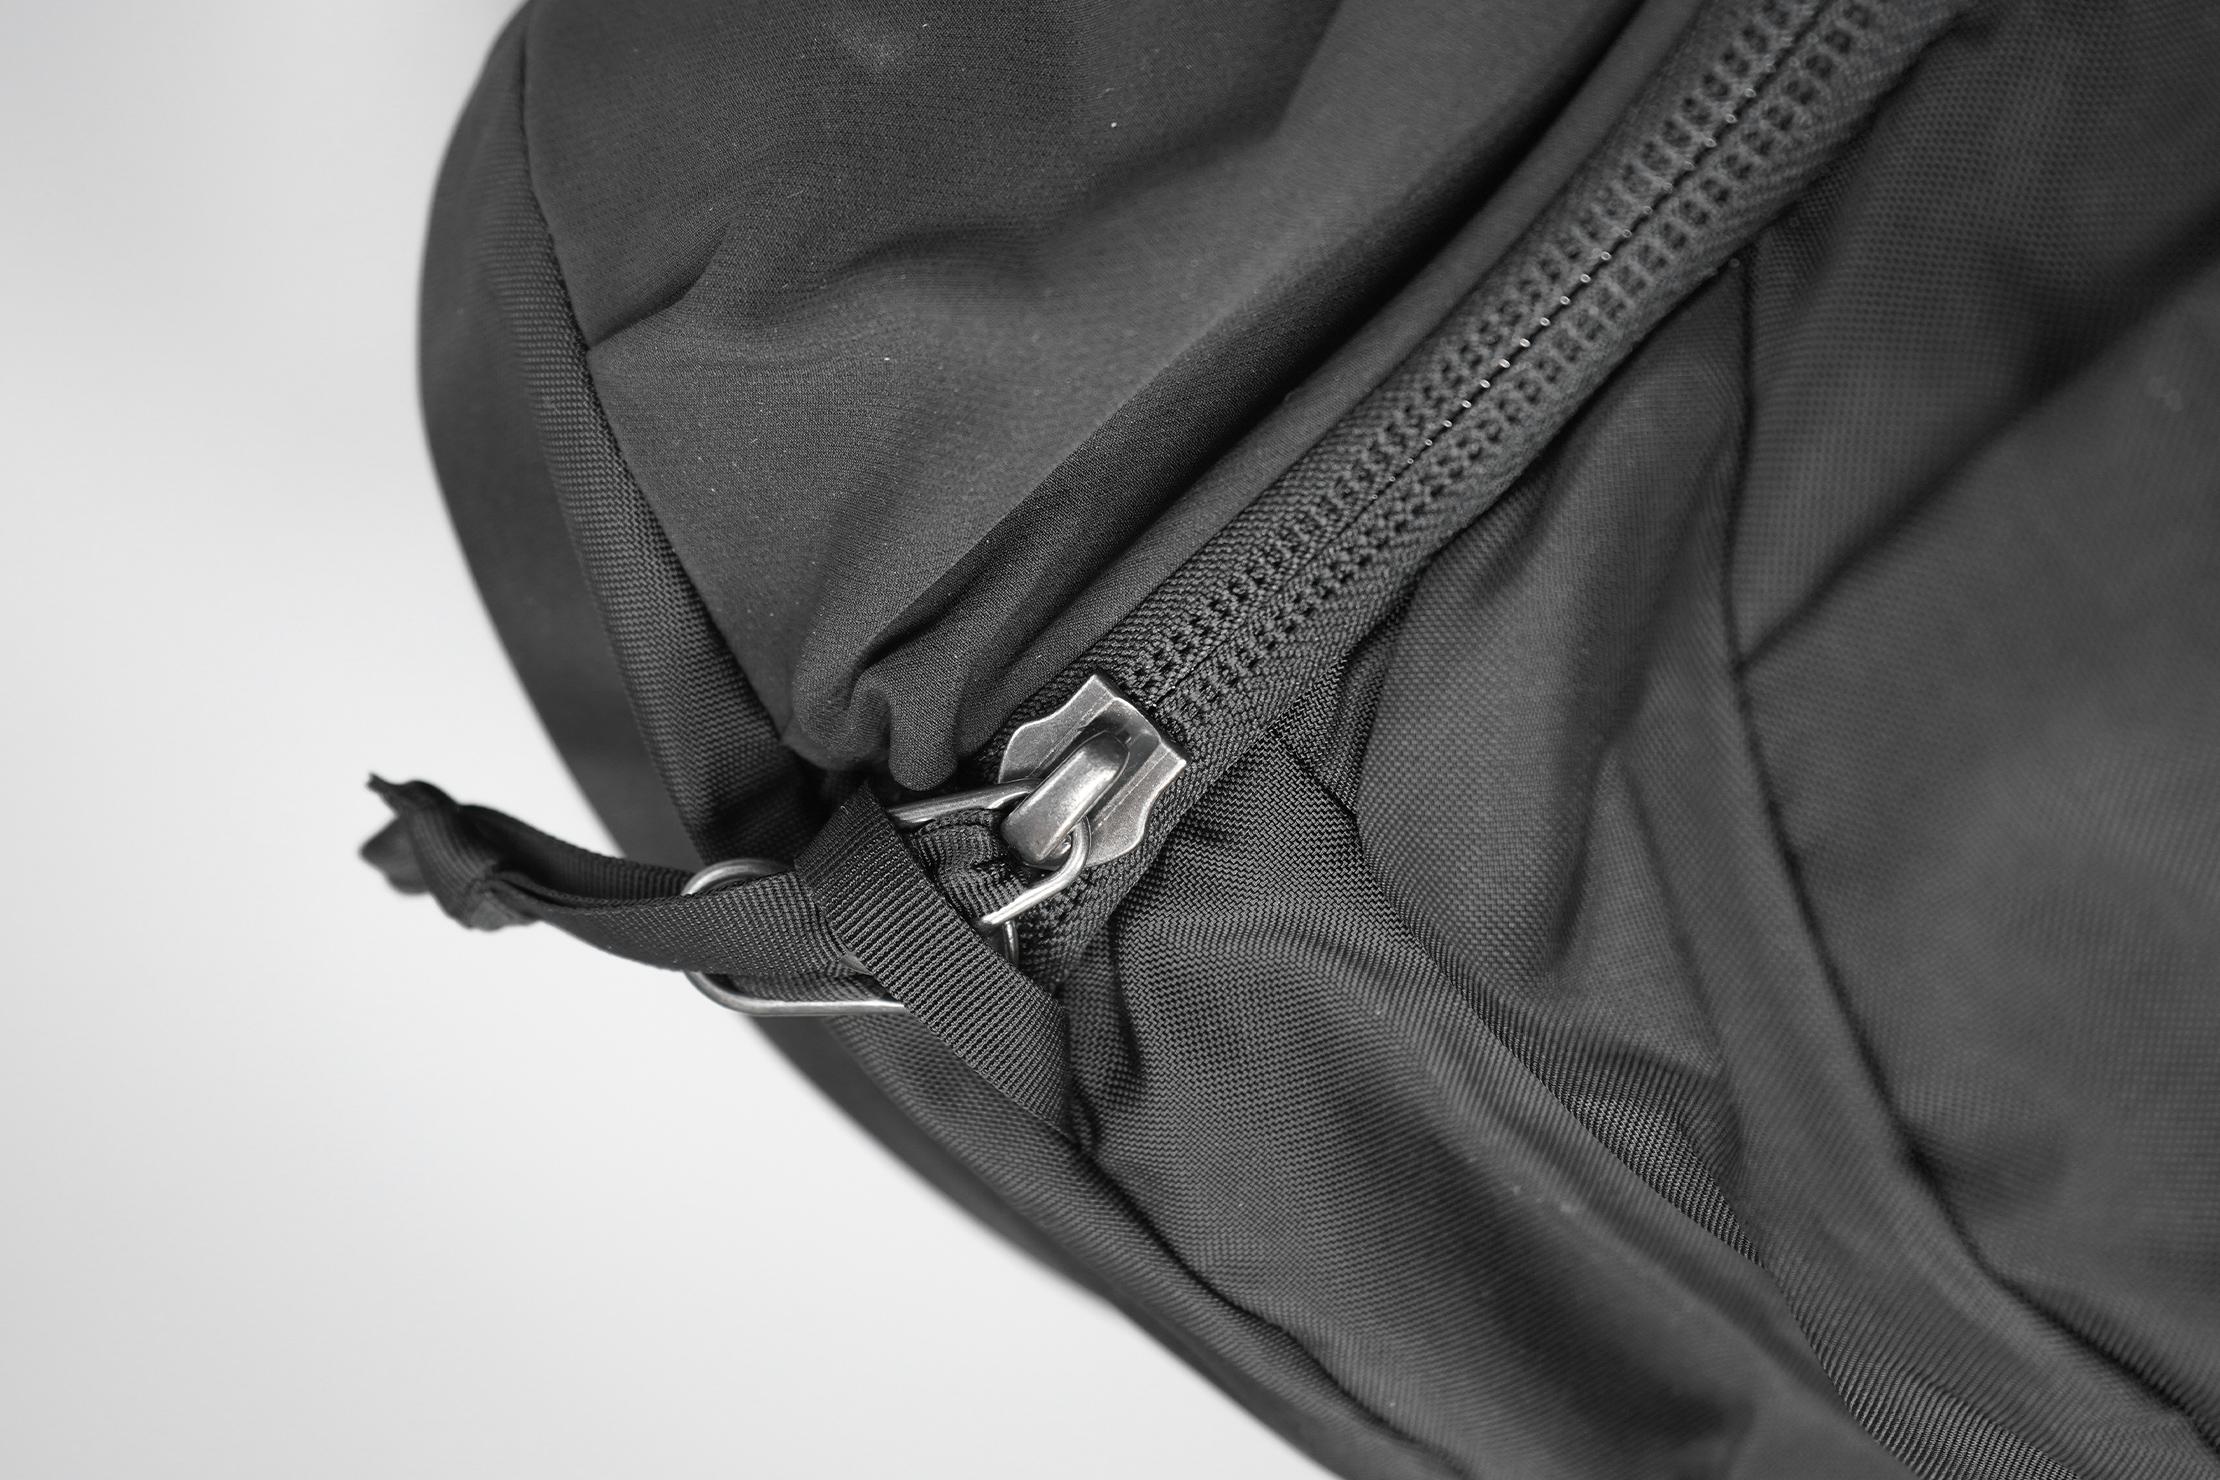 EVERGOODS MPL30 (V2) Zippers